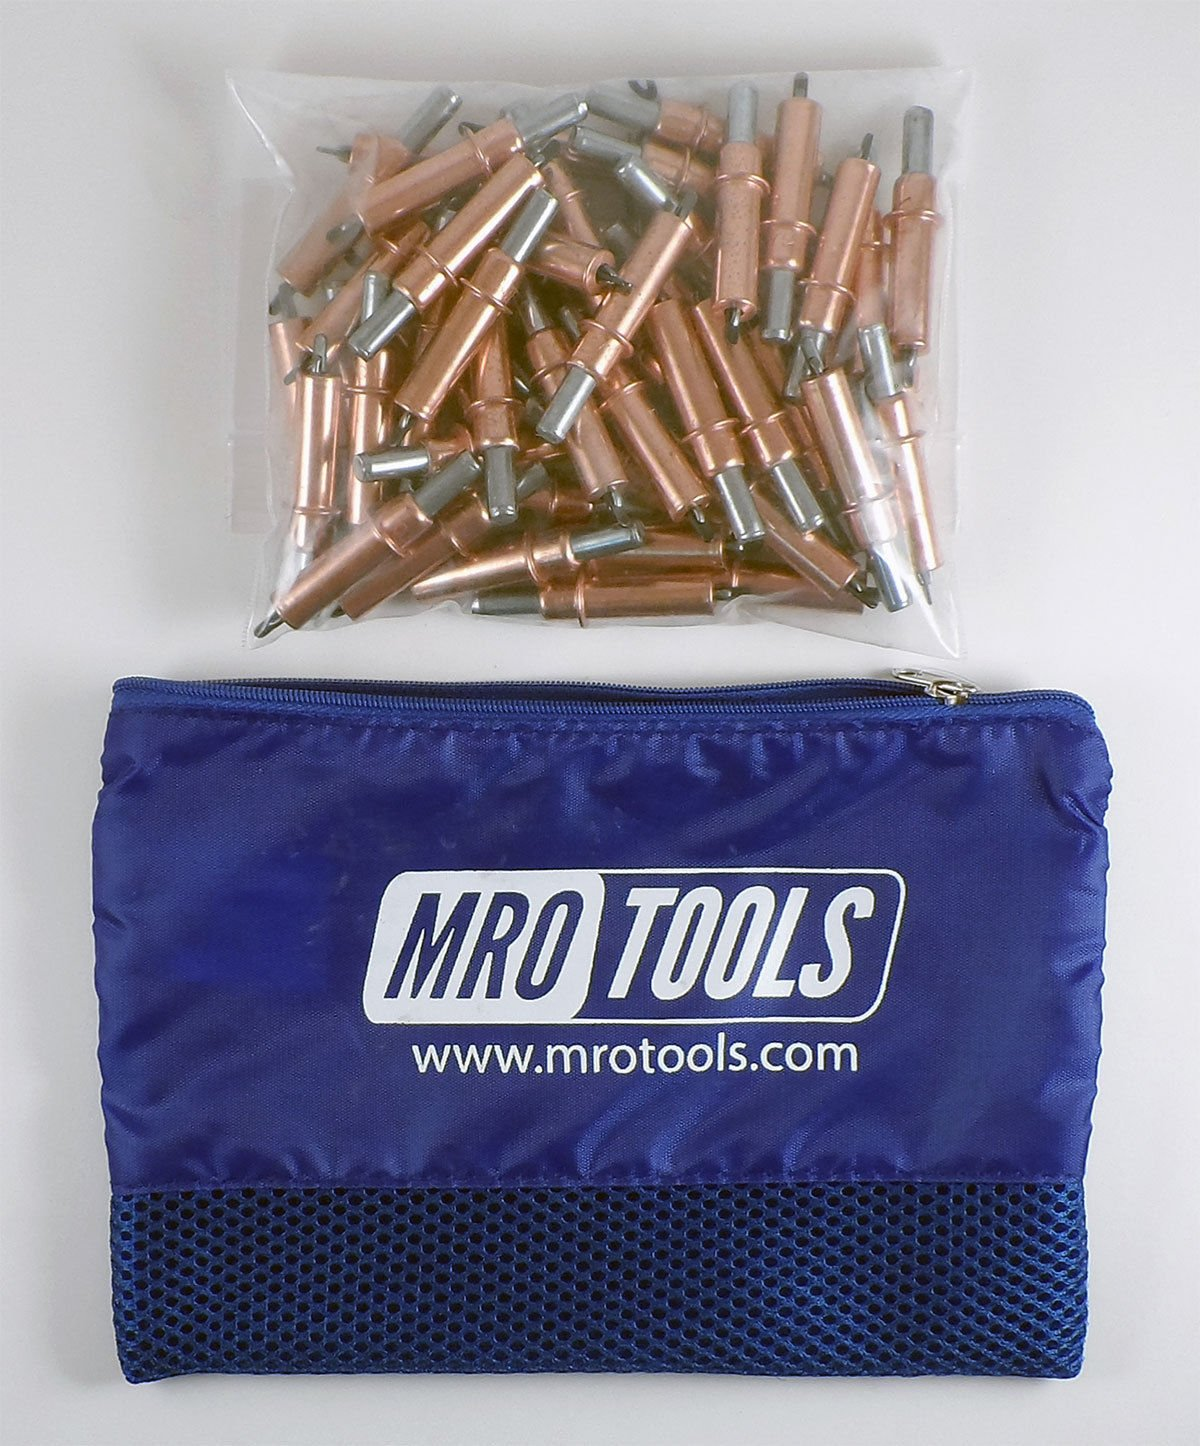 50 1/8 Cleco Sheet Metal Fasteners w/ Mesh Carry Bag (K2S50-1/8)